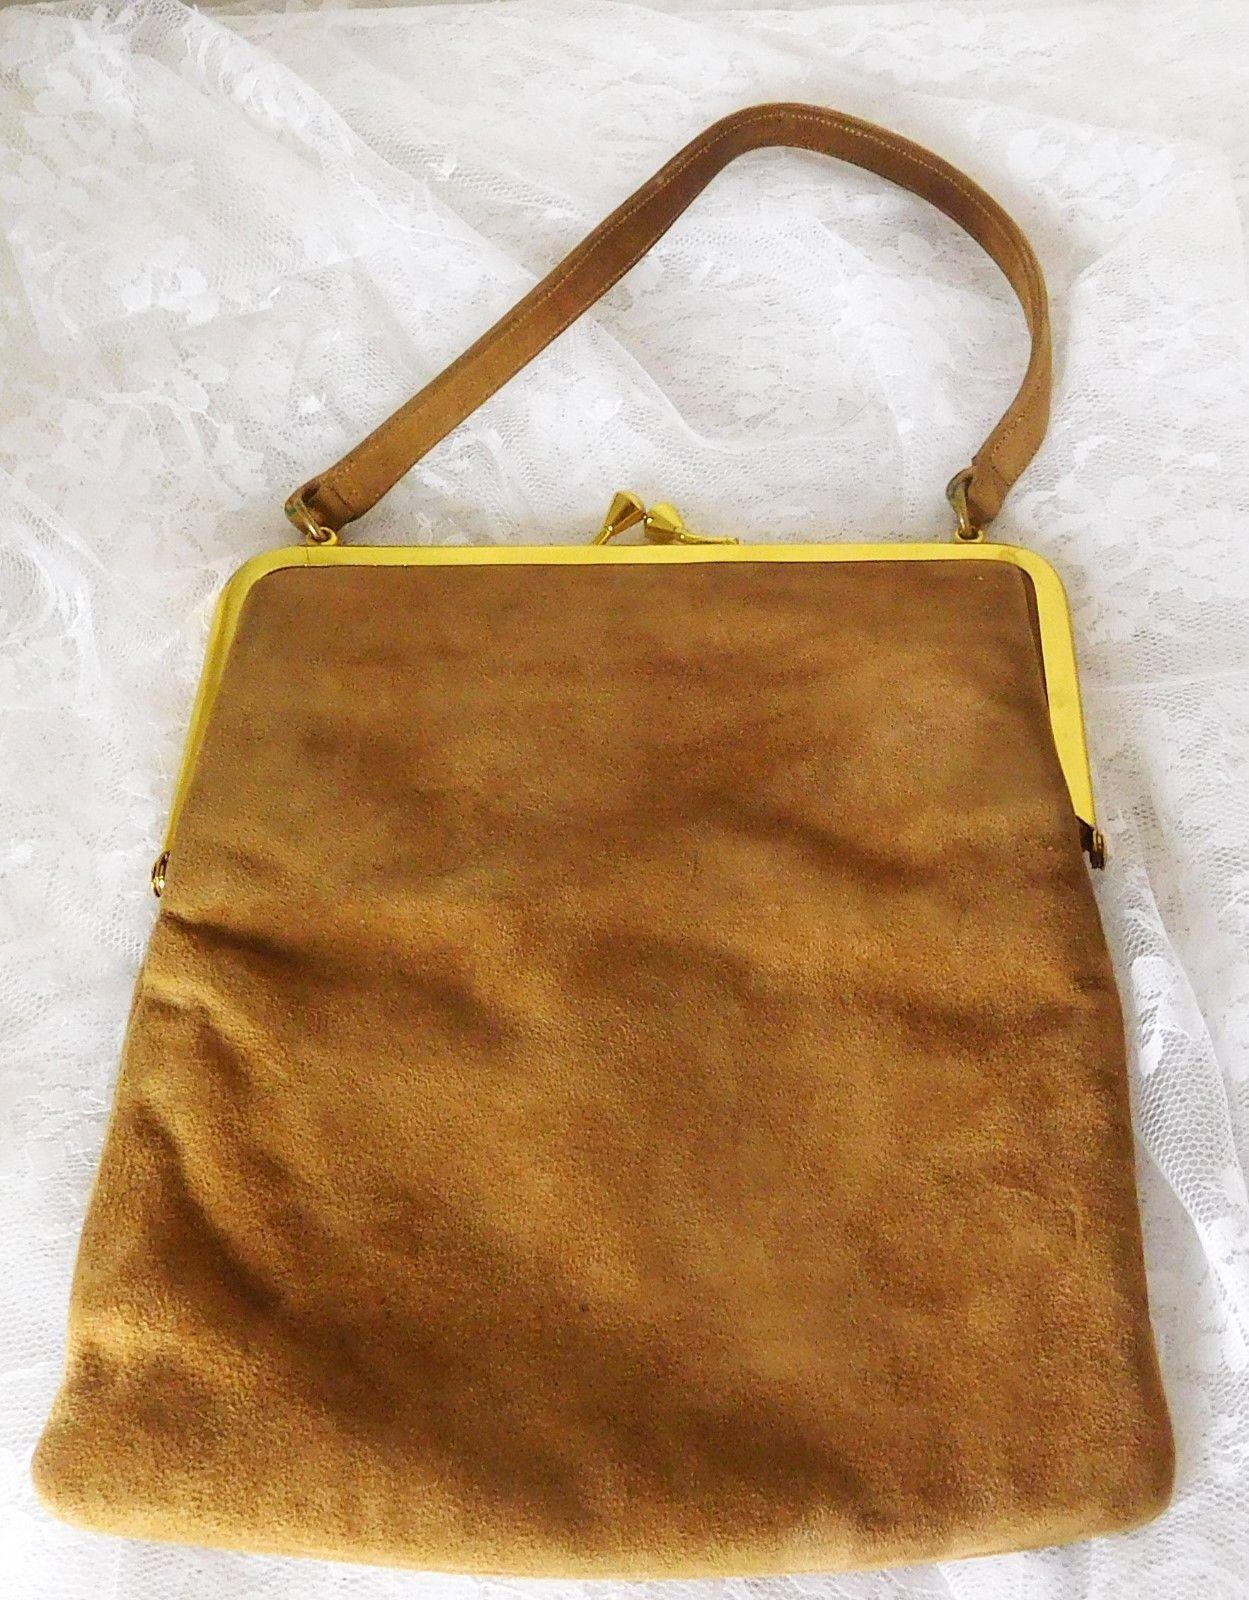 BLOCK Vintage Light Brown Suede Clutch Purse and 50 similar items. S l1600 52c0ebc0740d2